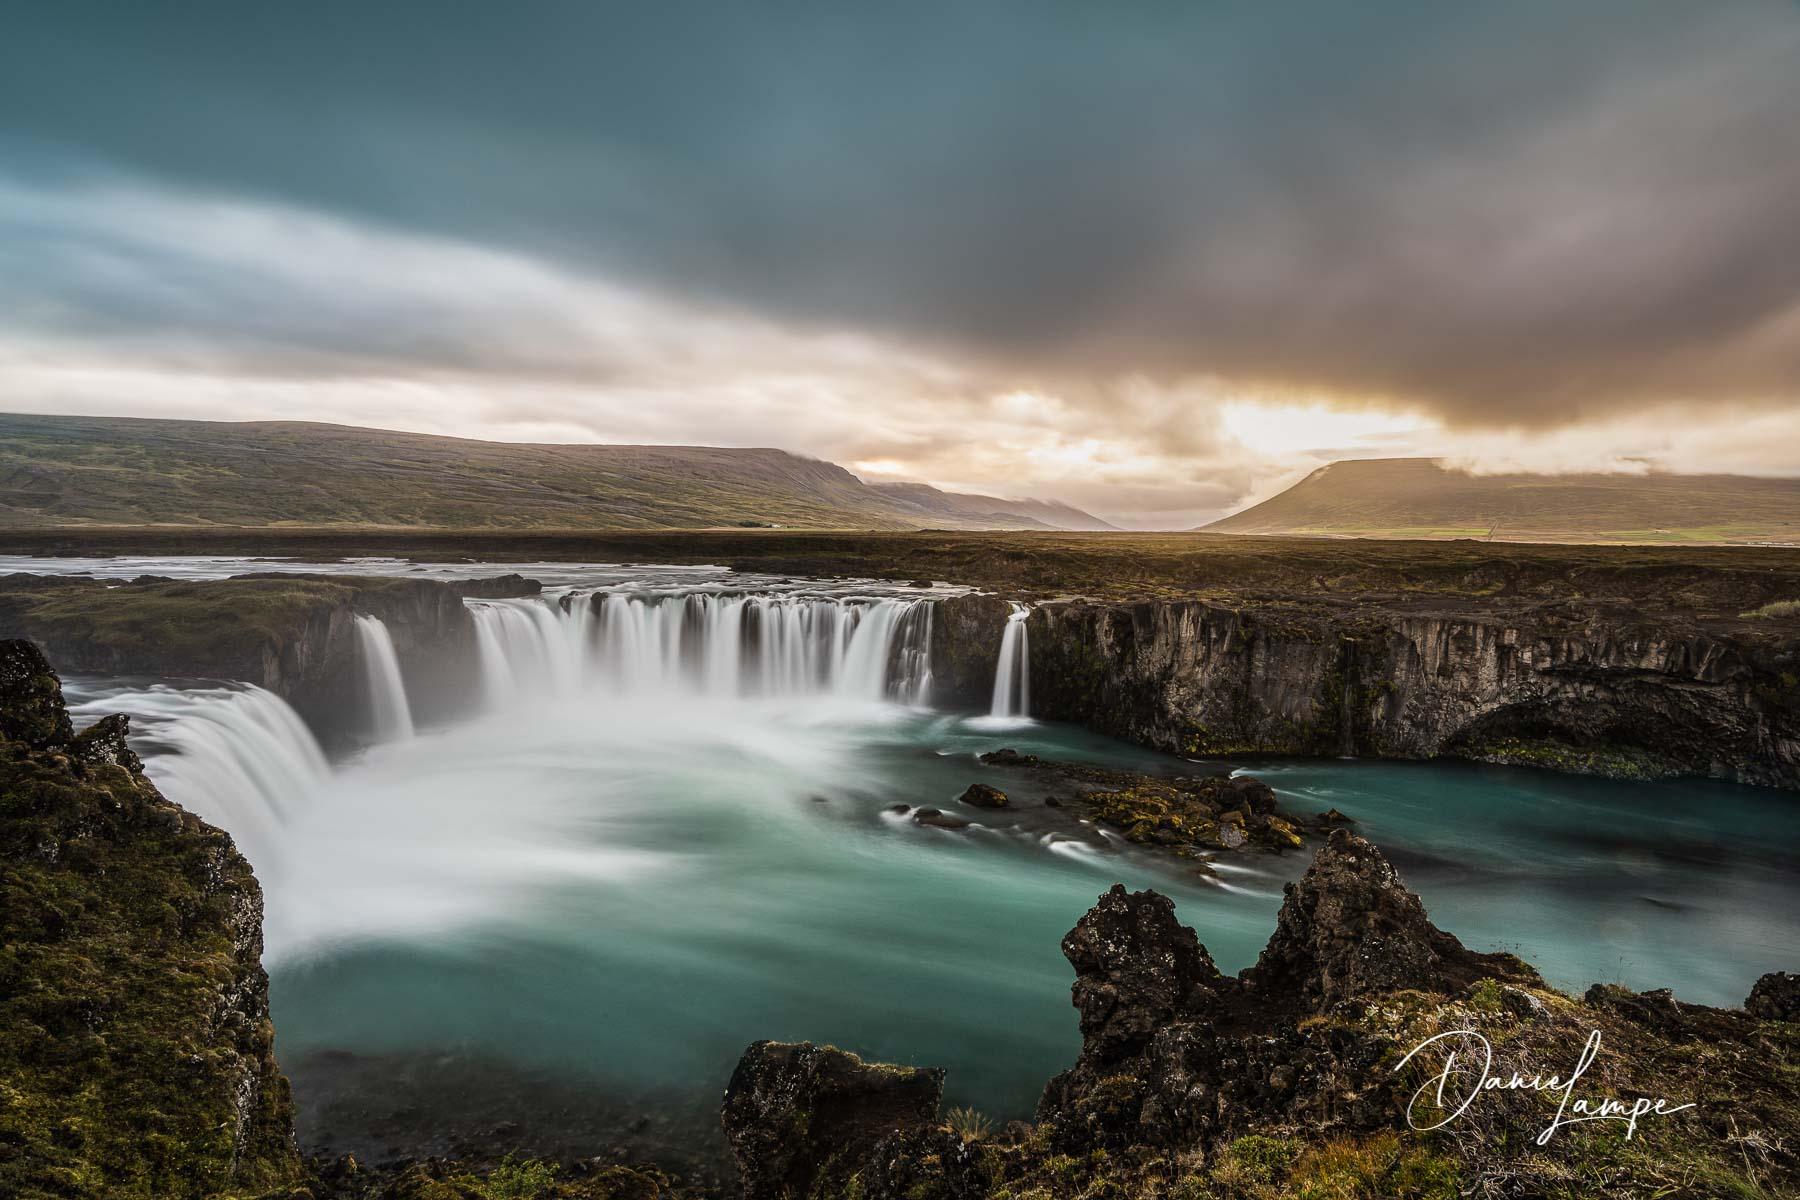 Island, Godafoss, Wasserfall, Sonnenuntergang